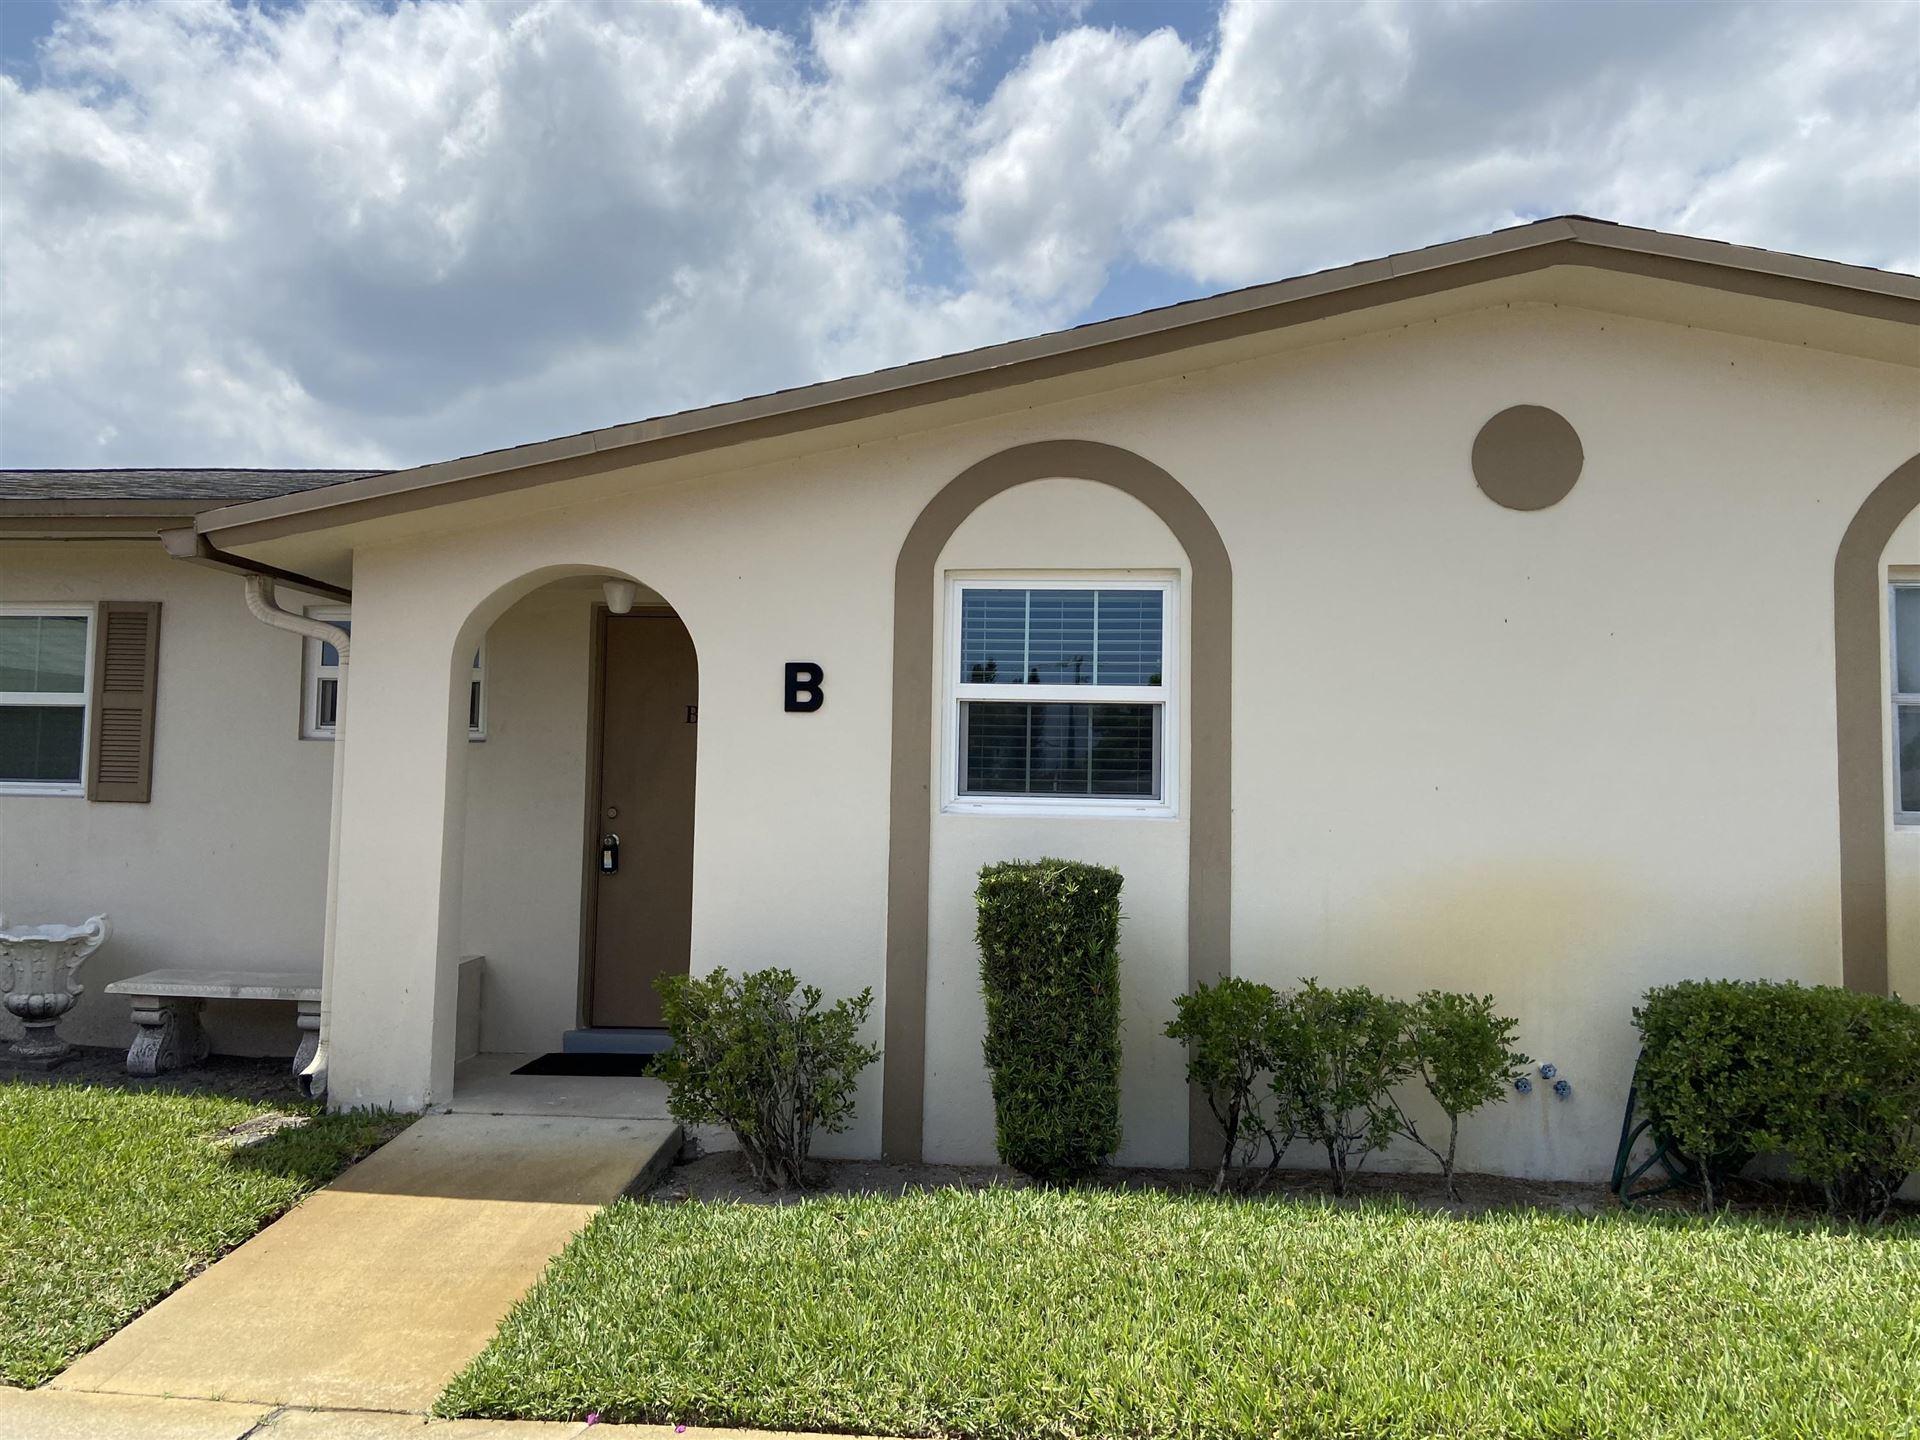 2680 Barkley Drive E #B, West Palm Beach, FL 33415 - MLS#: RX-10711909